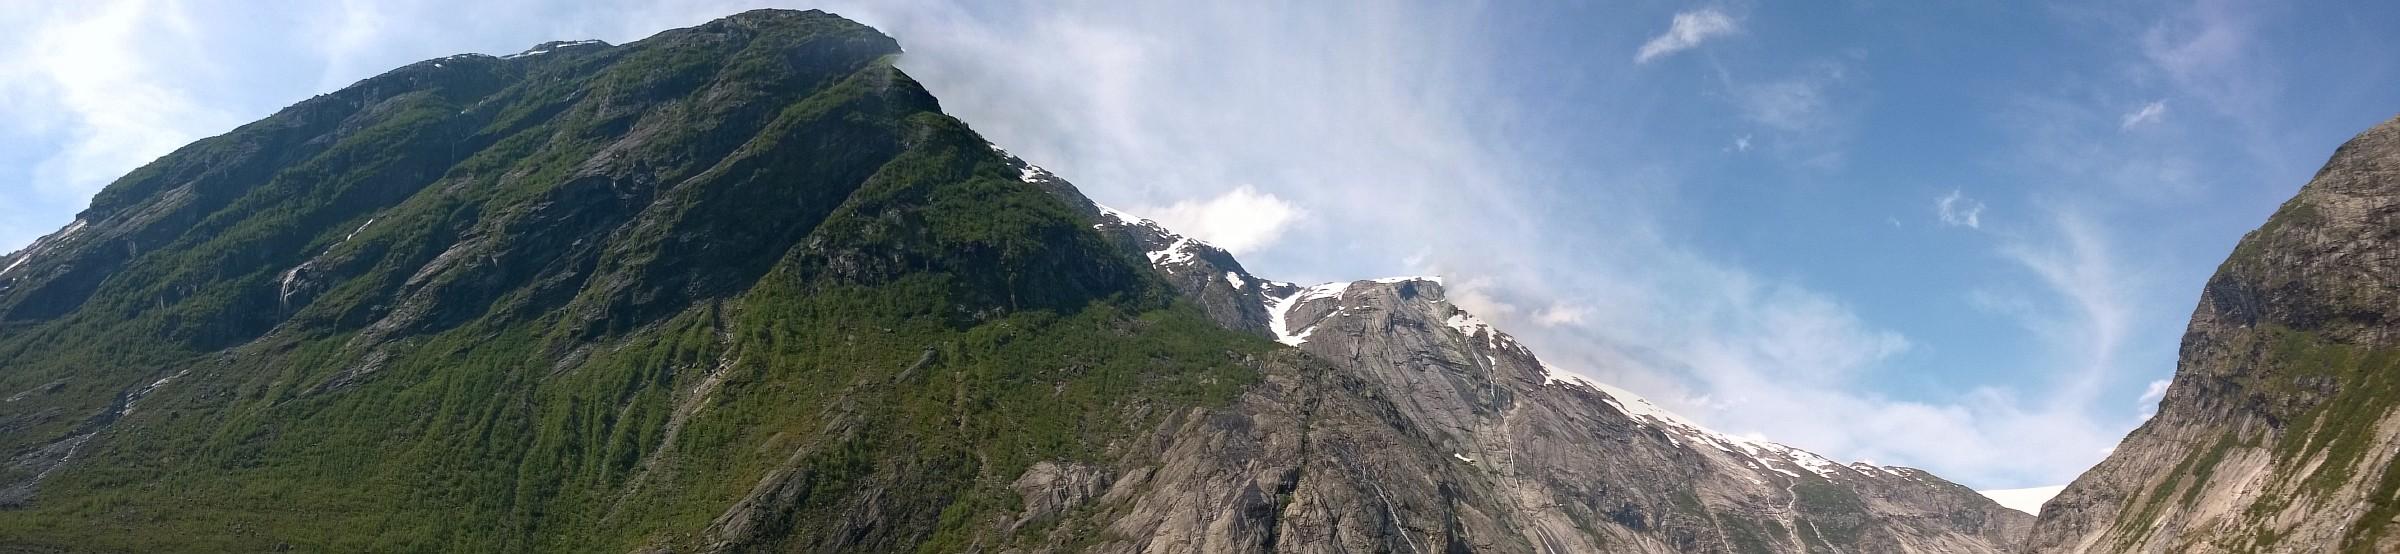 nordfjord, norway, Норвегия, фотография, Аксанов Нияз, путешествия, kukmor, livejournal, блогтур, Согне-фьорд, Нигардсбреен, of WP_20140709_13_07_12_Panorama